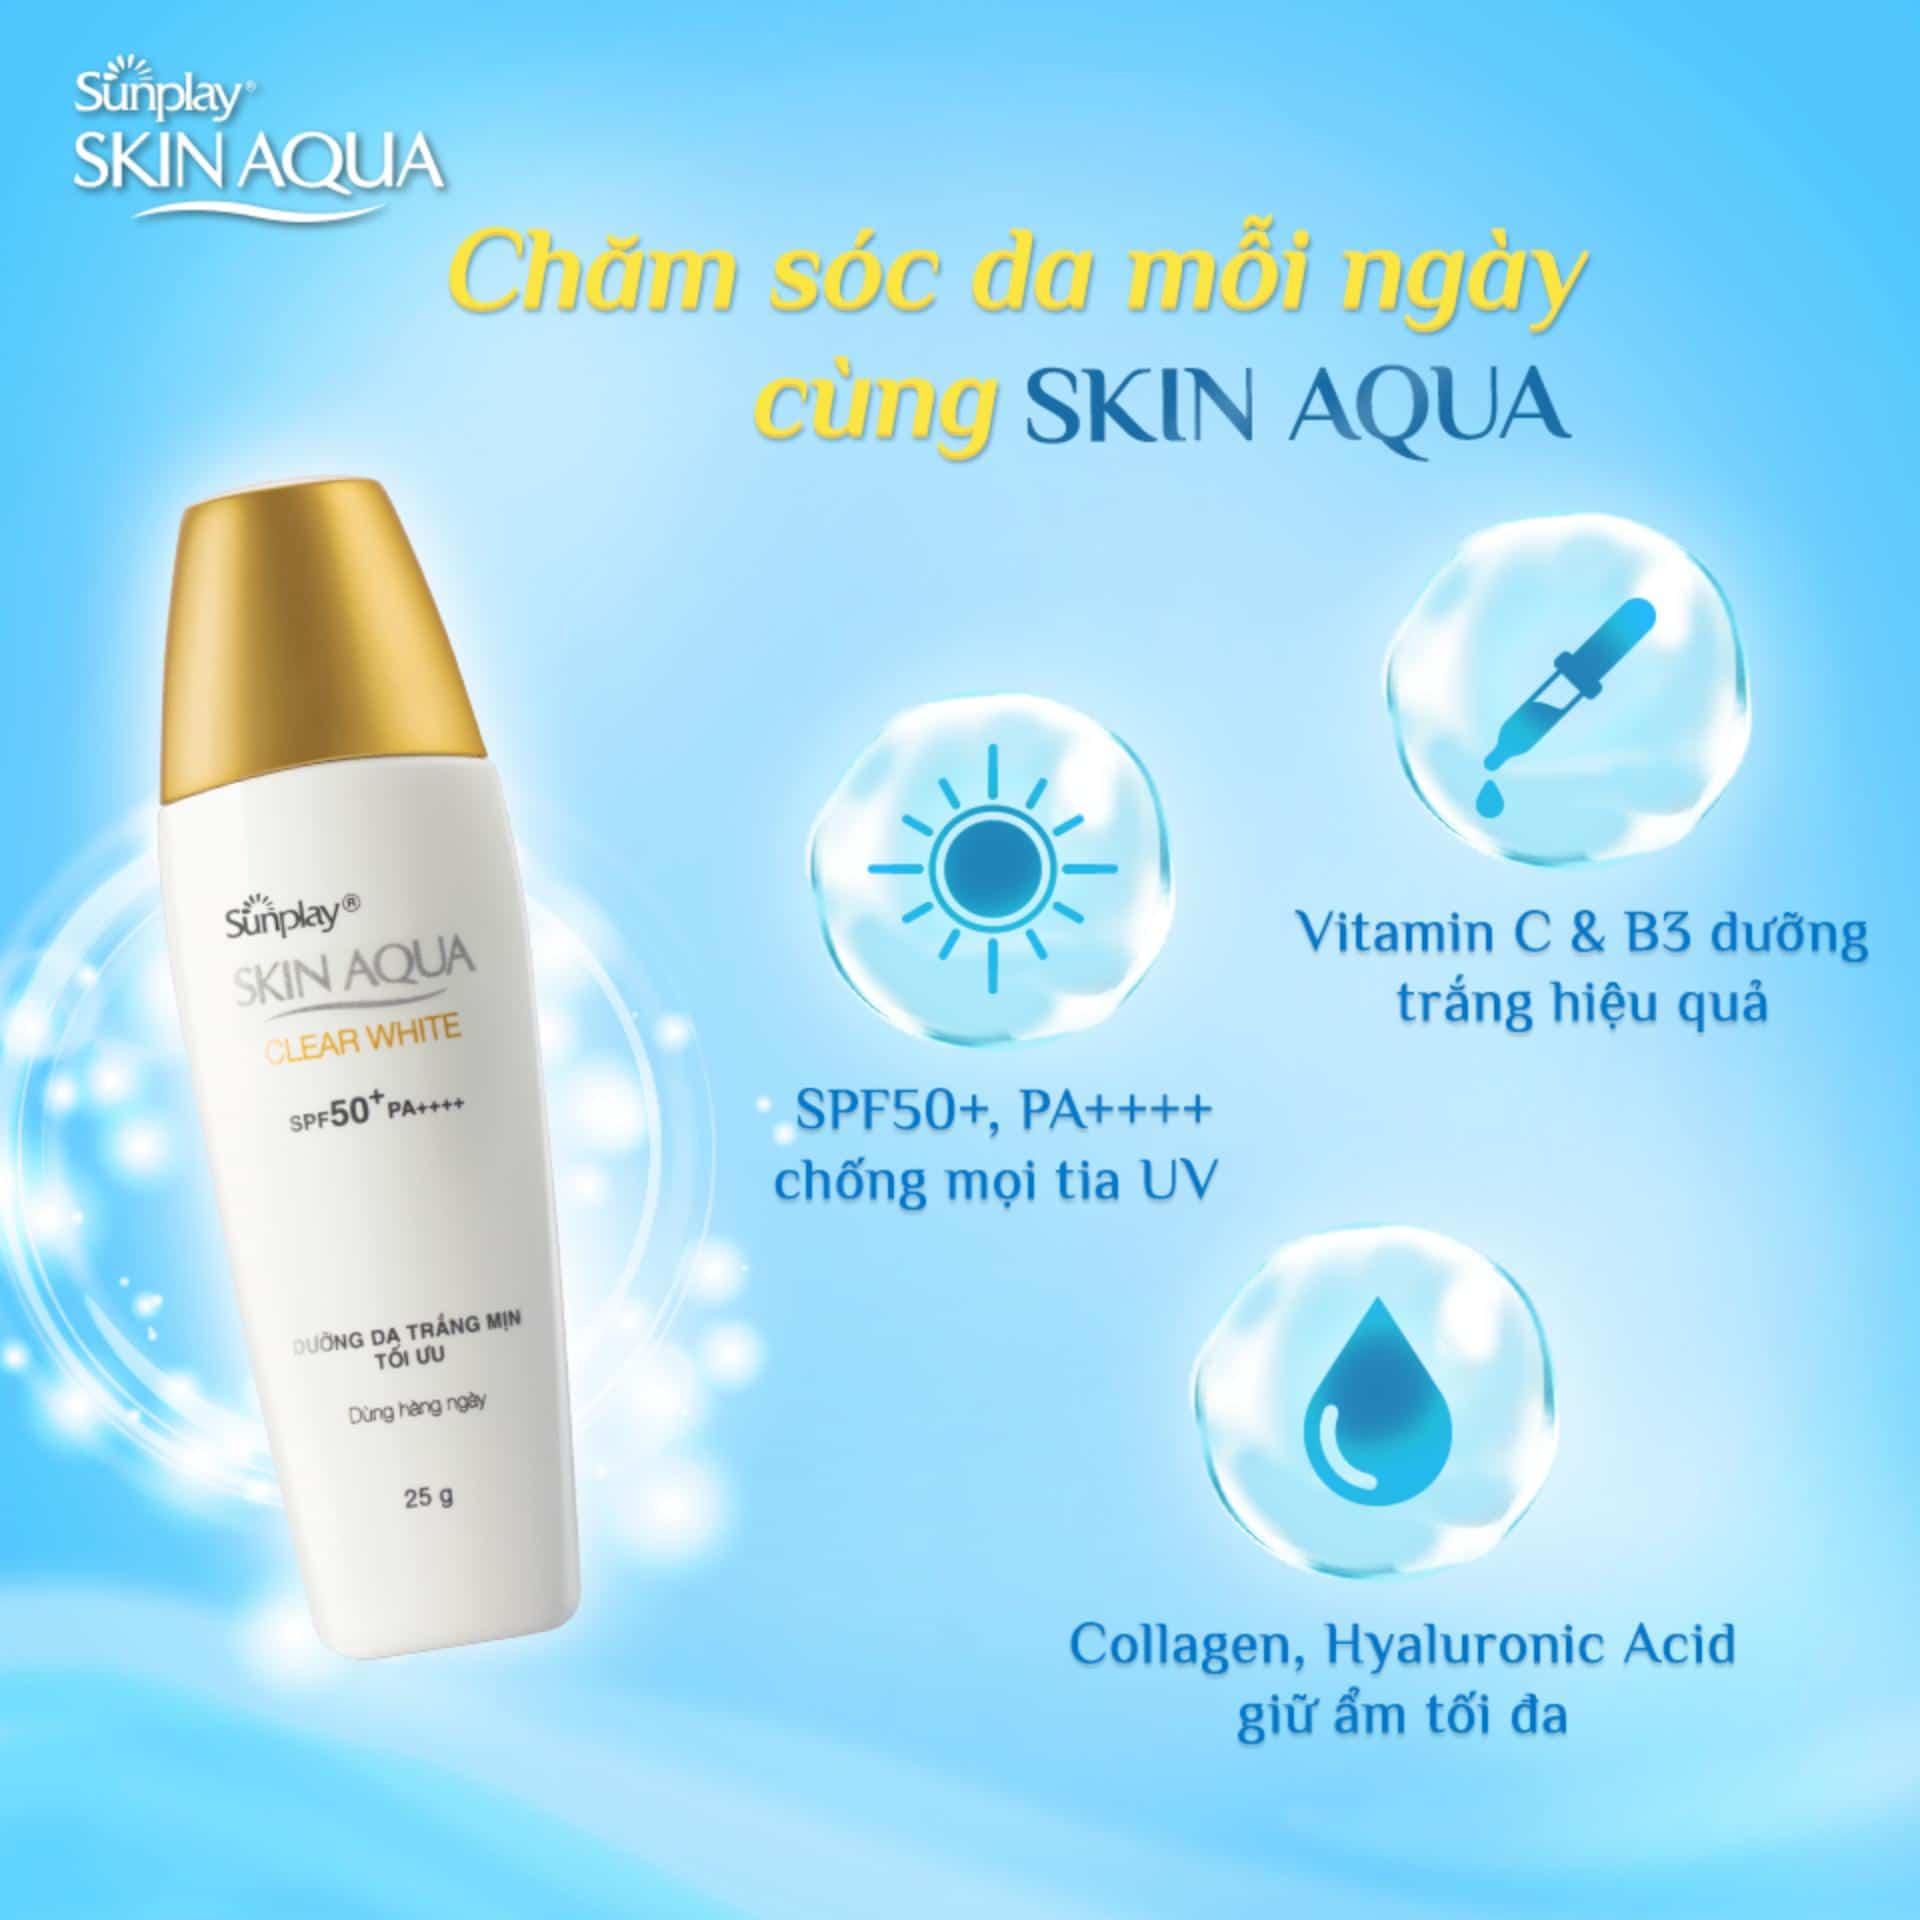 kem chống nắng skin aqua clear white